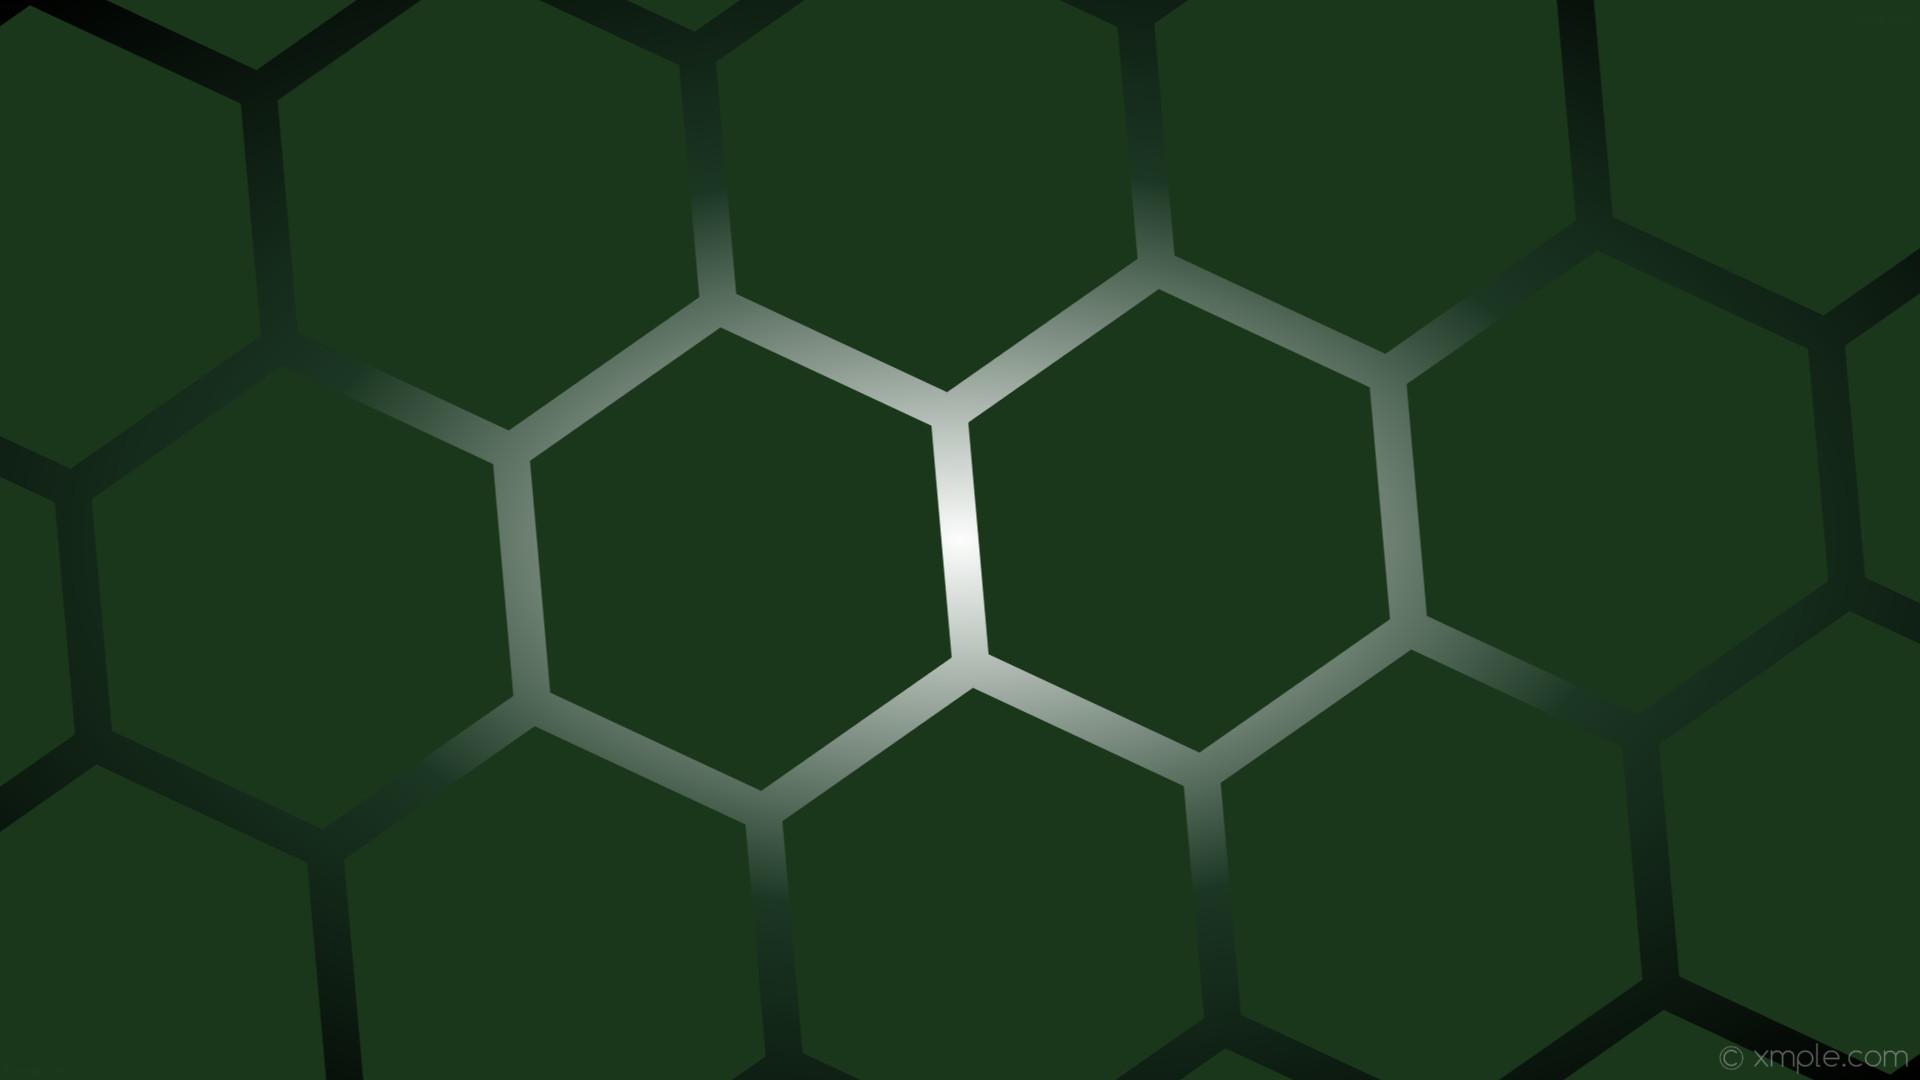 wallpaper gradient white black hexagon turquoise glow green dark green dark  turquoise #1b371b #ffffff